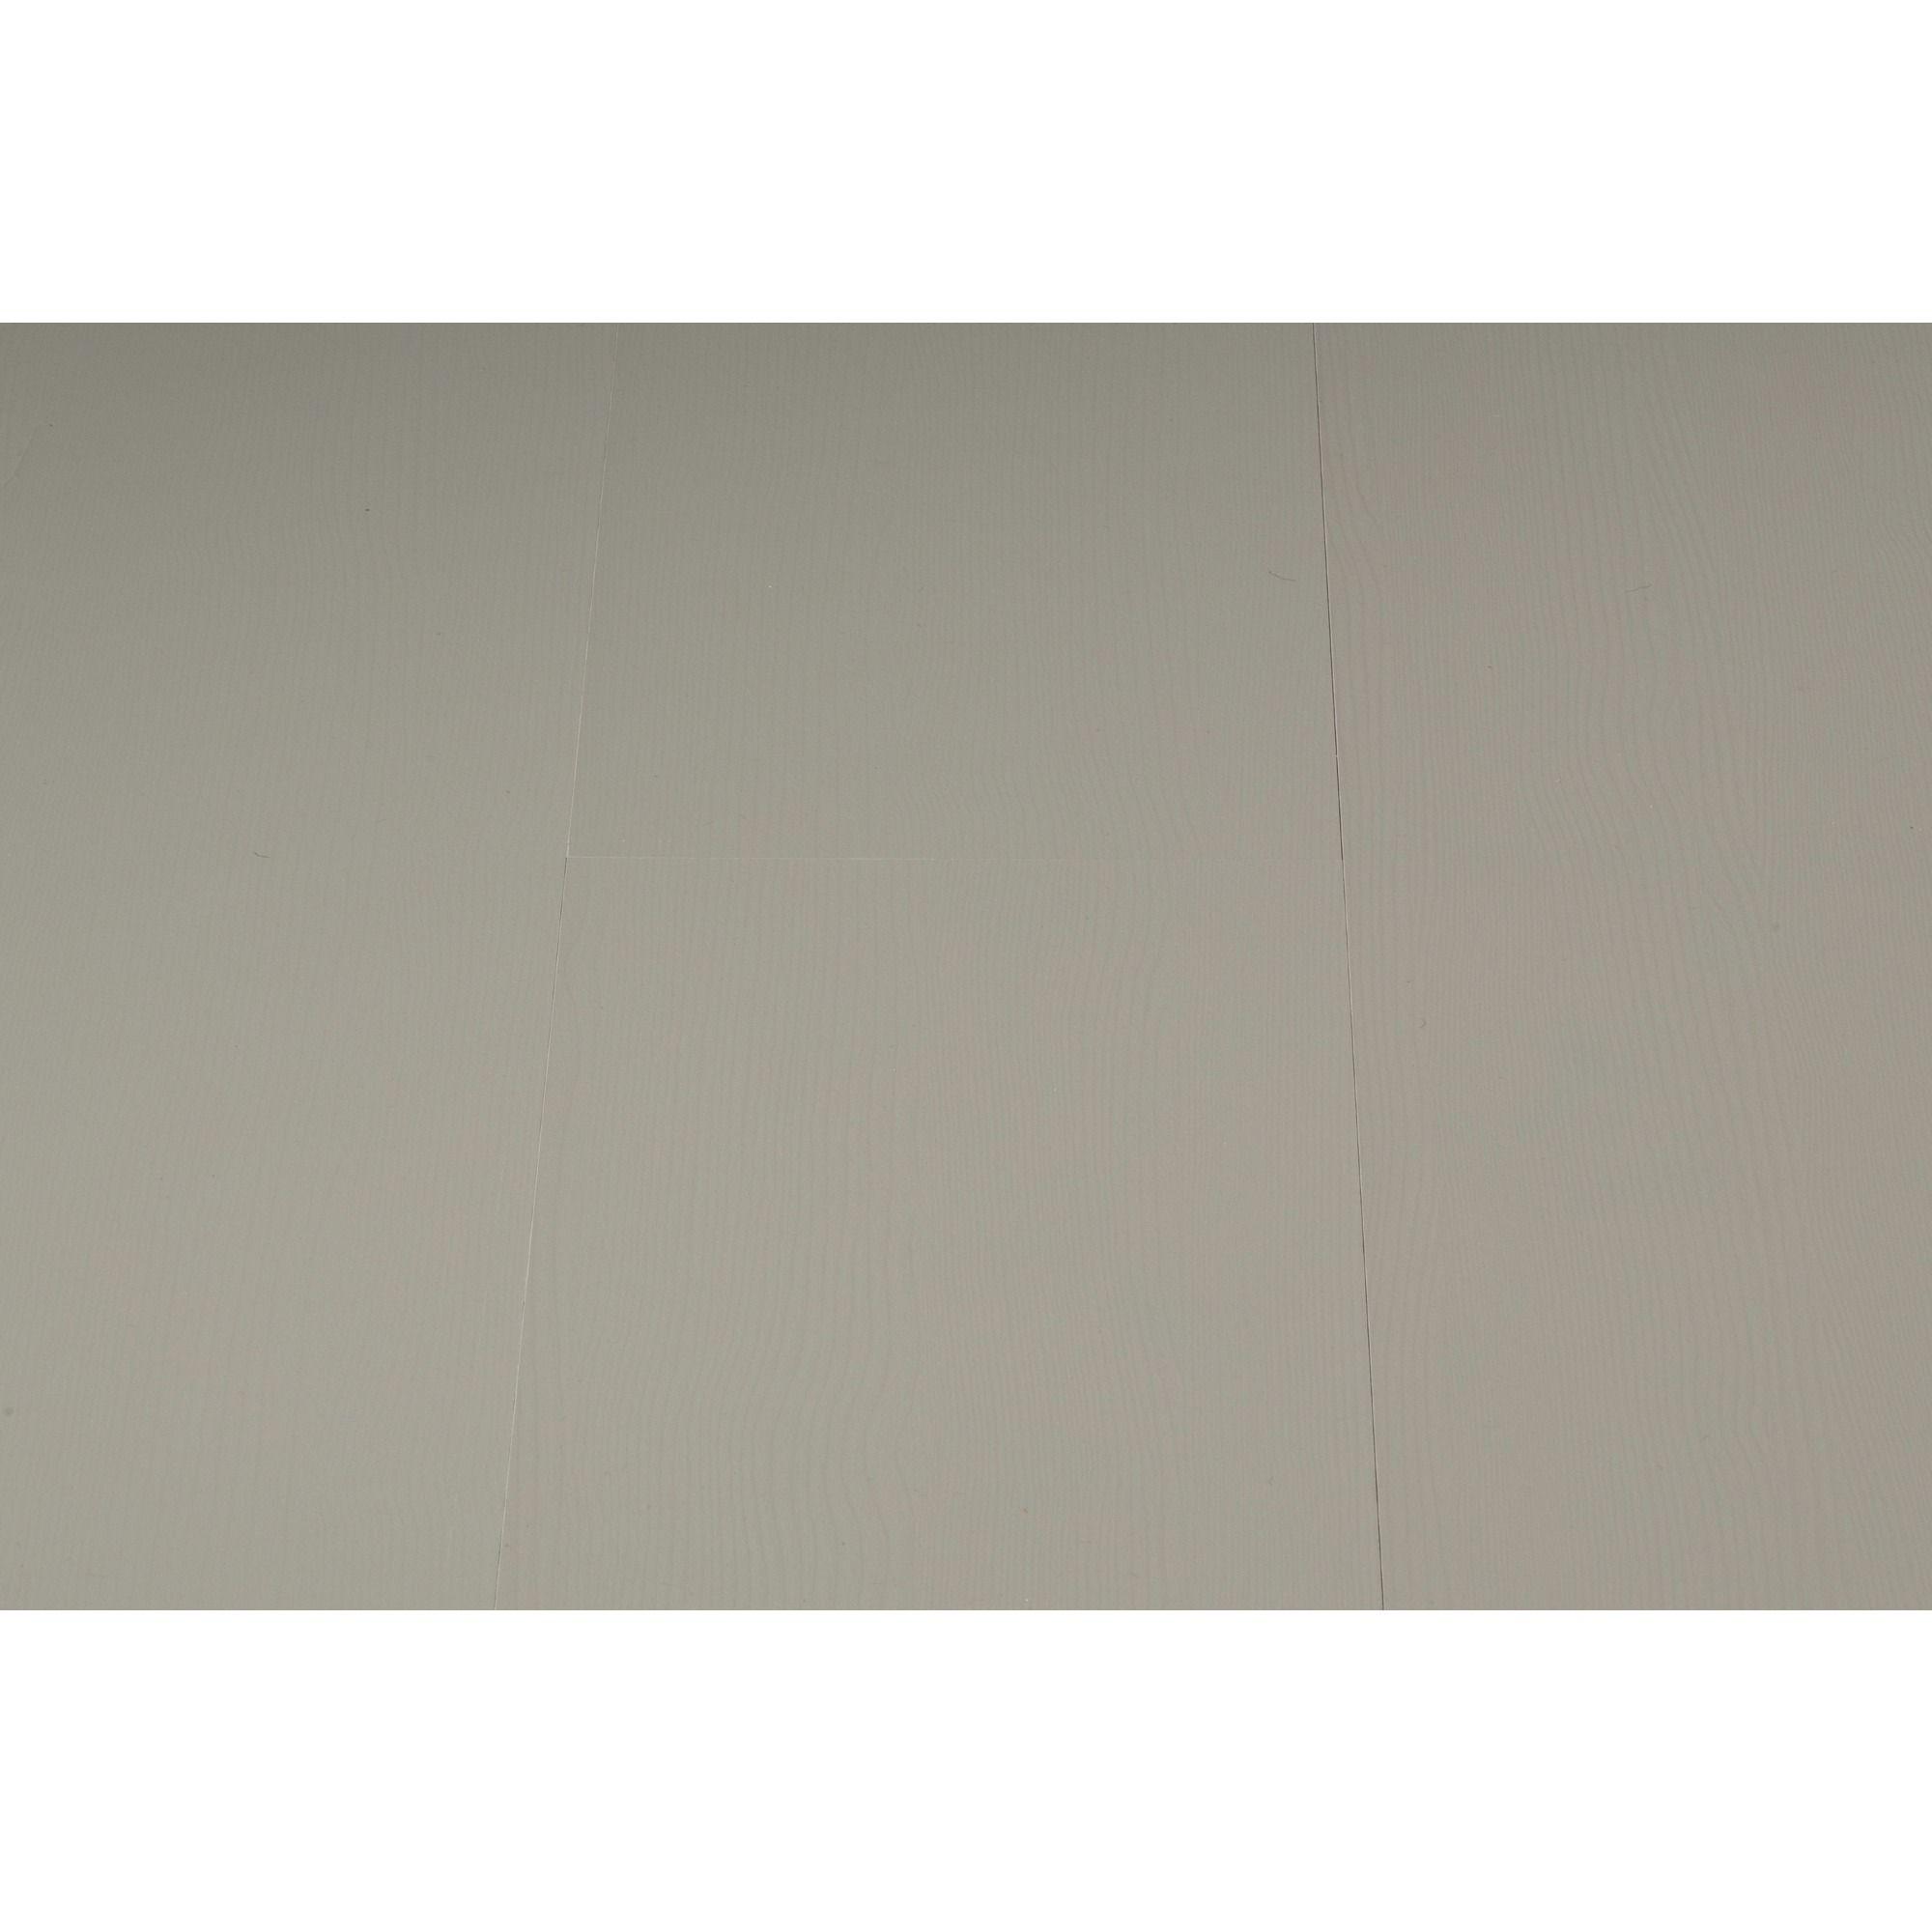 vtwonen loft laminaat kiezel 1 86 mbedroom pinterest bedrooms